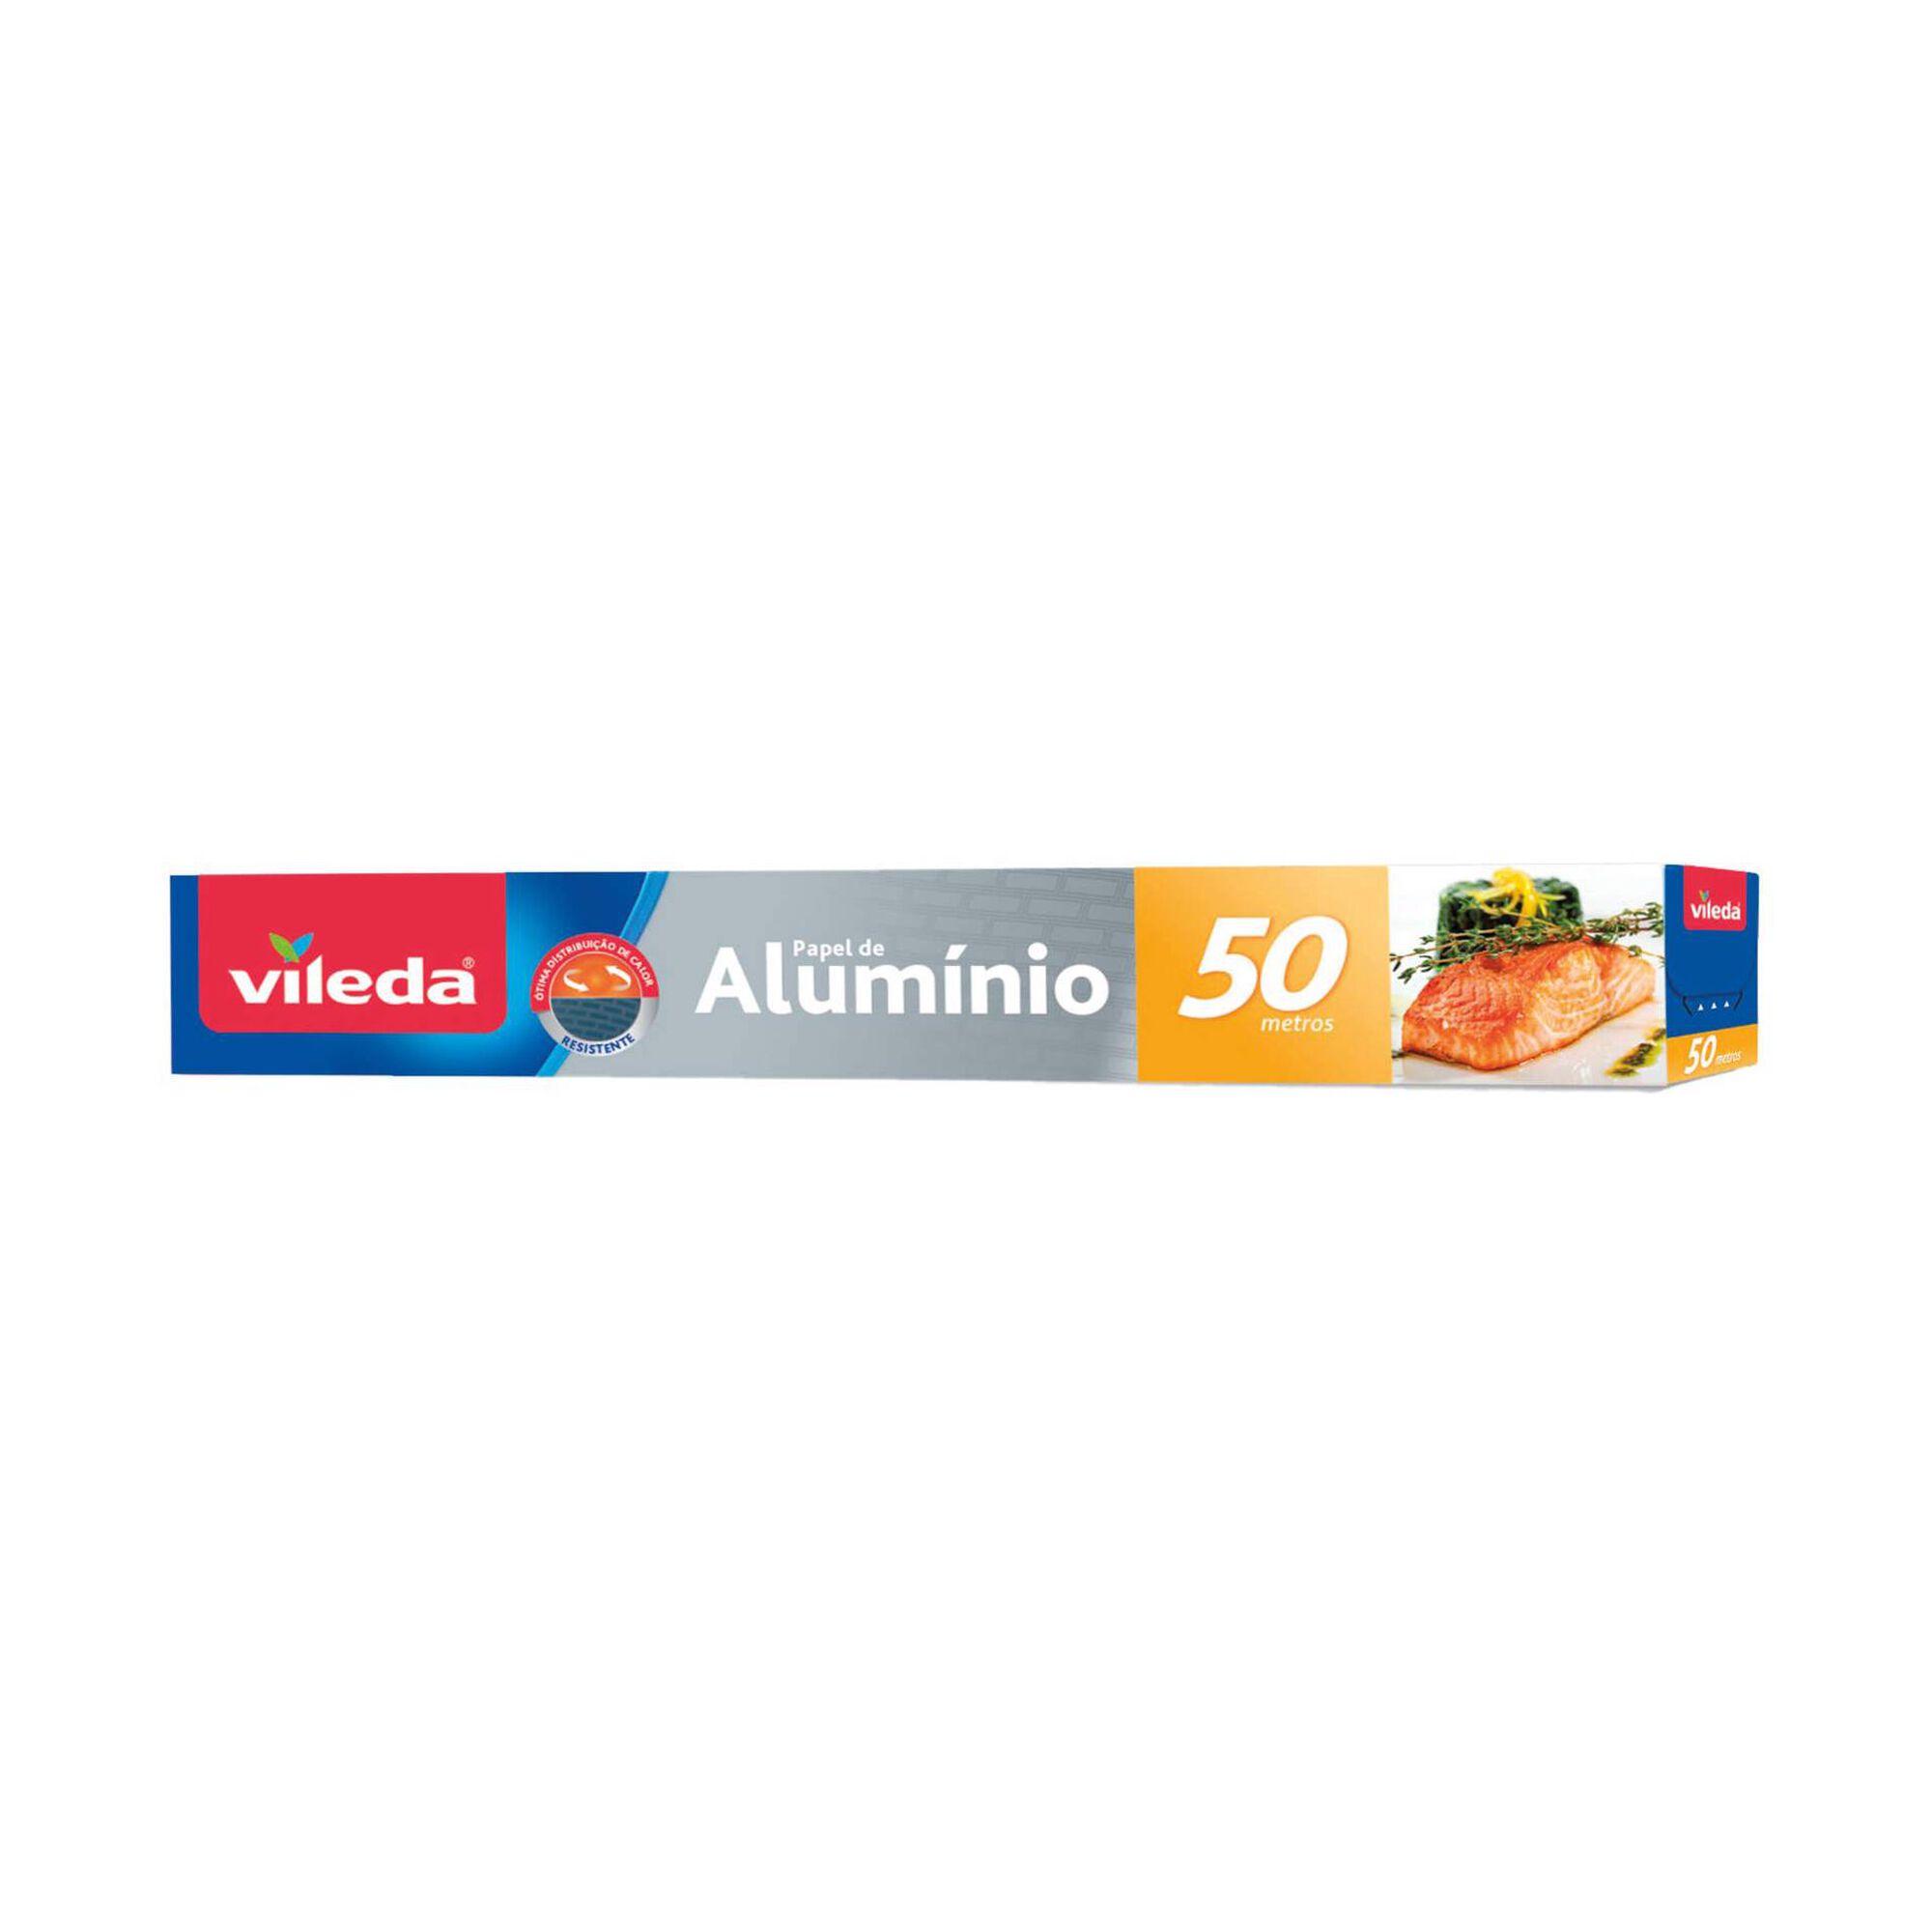 Papel de Alumínio Freshmate 50m